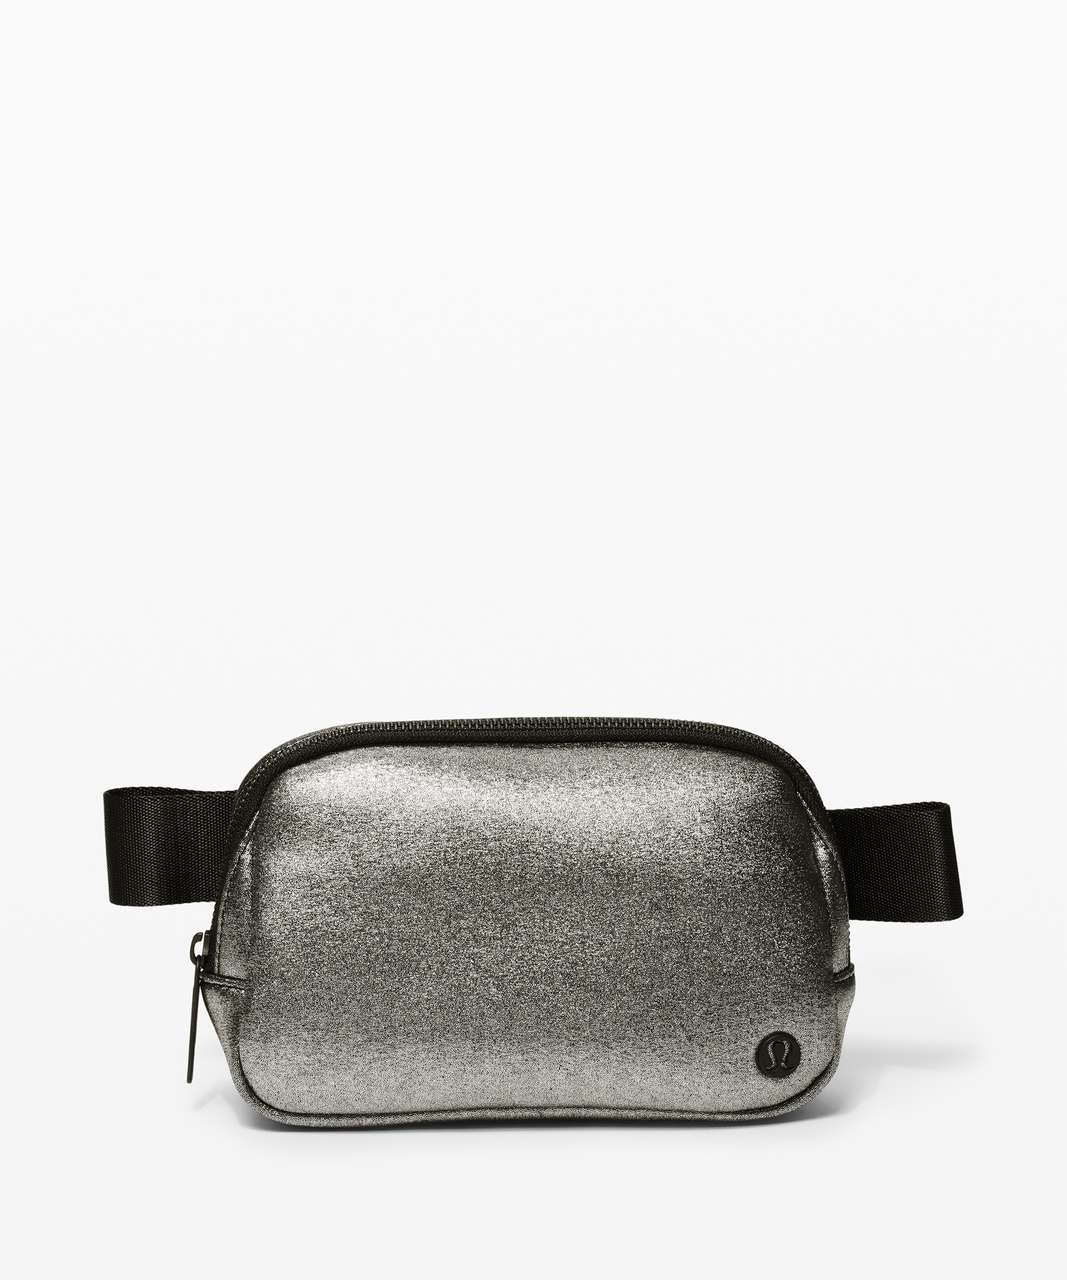 Lululemon Everywhere Belt Bag *1L - Black Sparkle